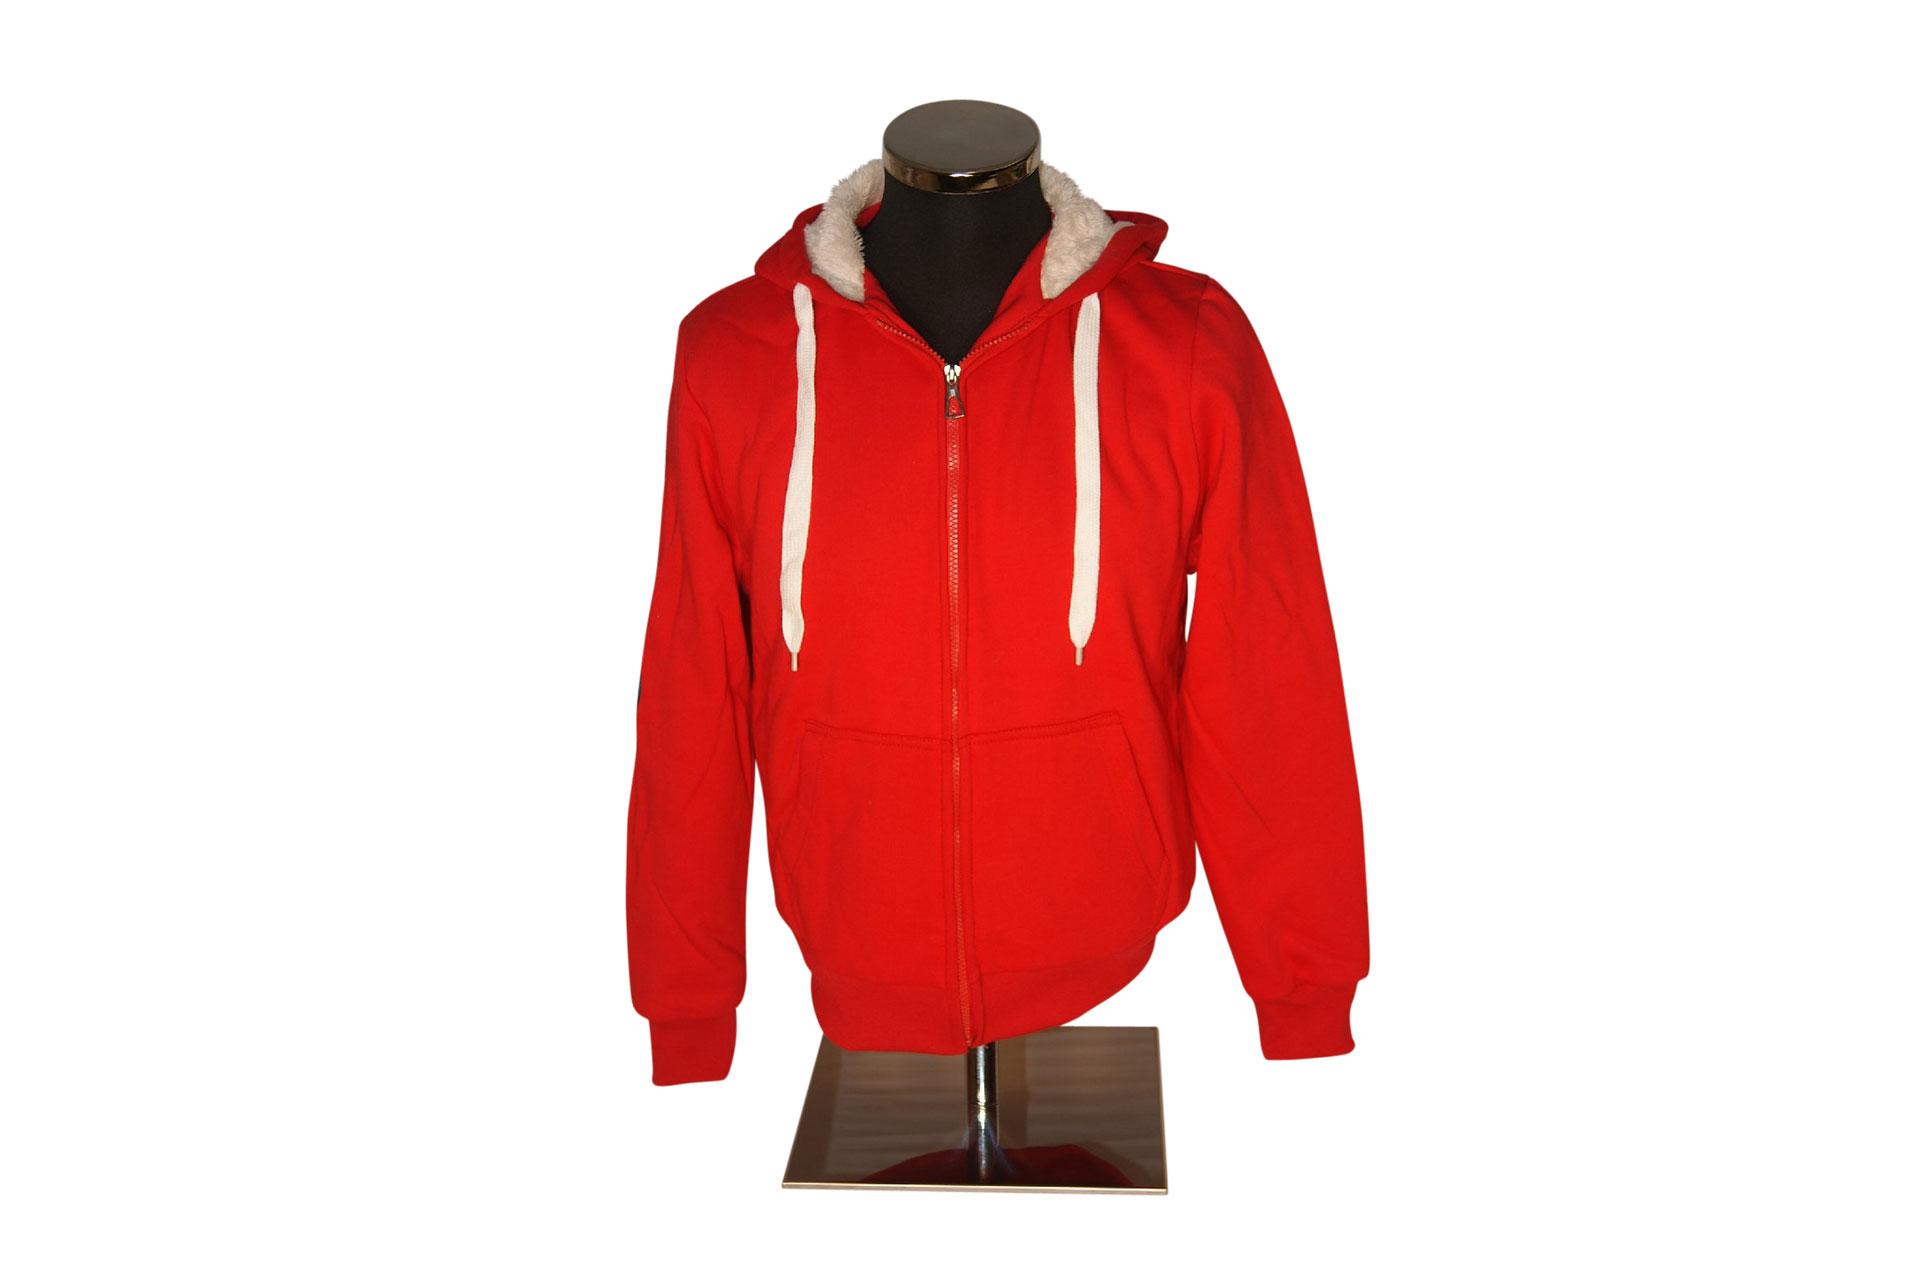 4cc54700c5d646 Arosa Zip Hoody Rot von Souvenir Shop Arosa - Aroser Souvenirs